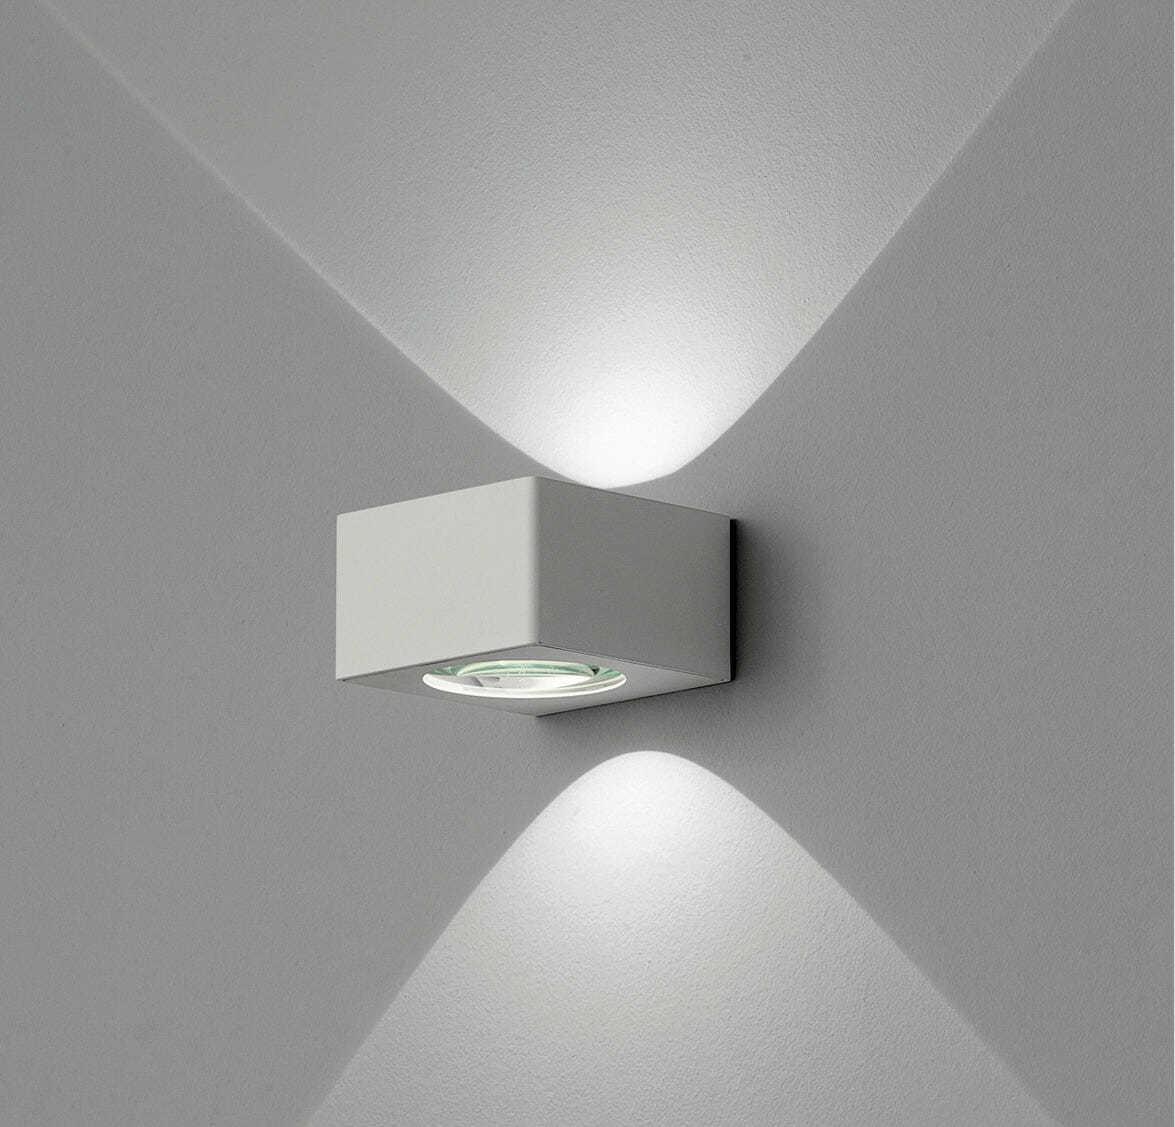 Lampada led parete biemissione lynn - Lampada led design ...